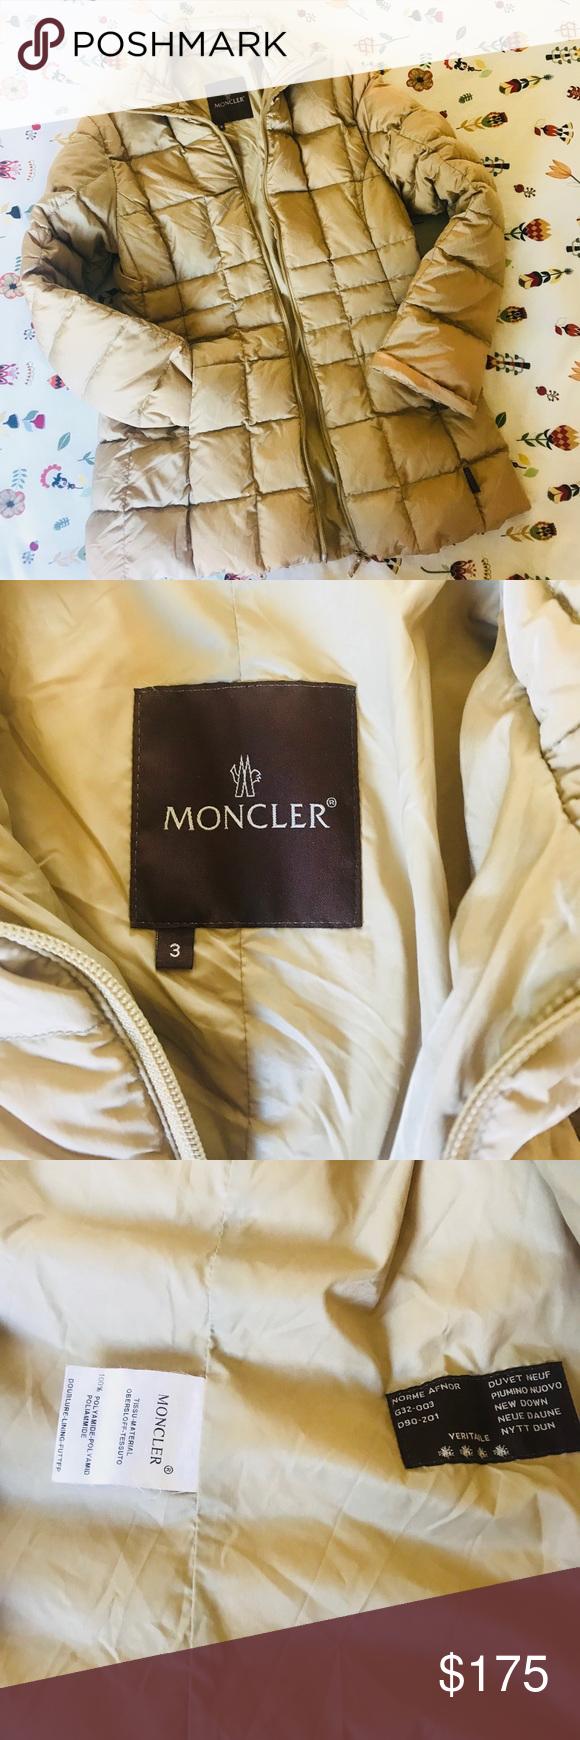 Women's Tan Moncler Jacket Duvet Down XiuOlZkwPT